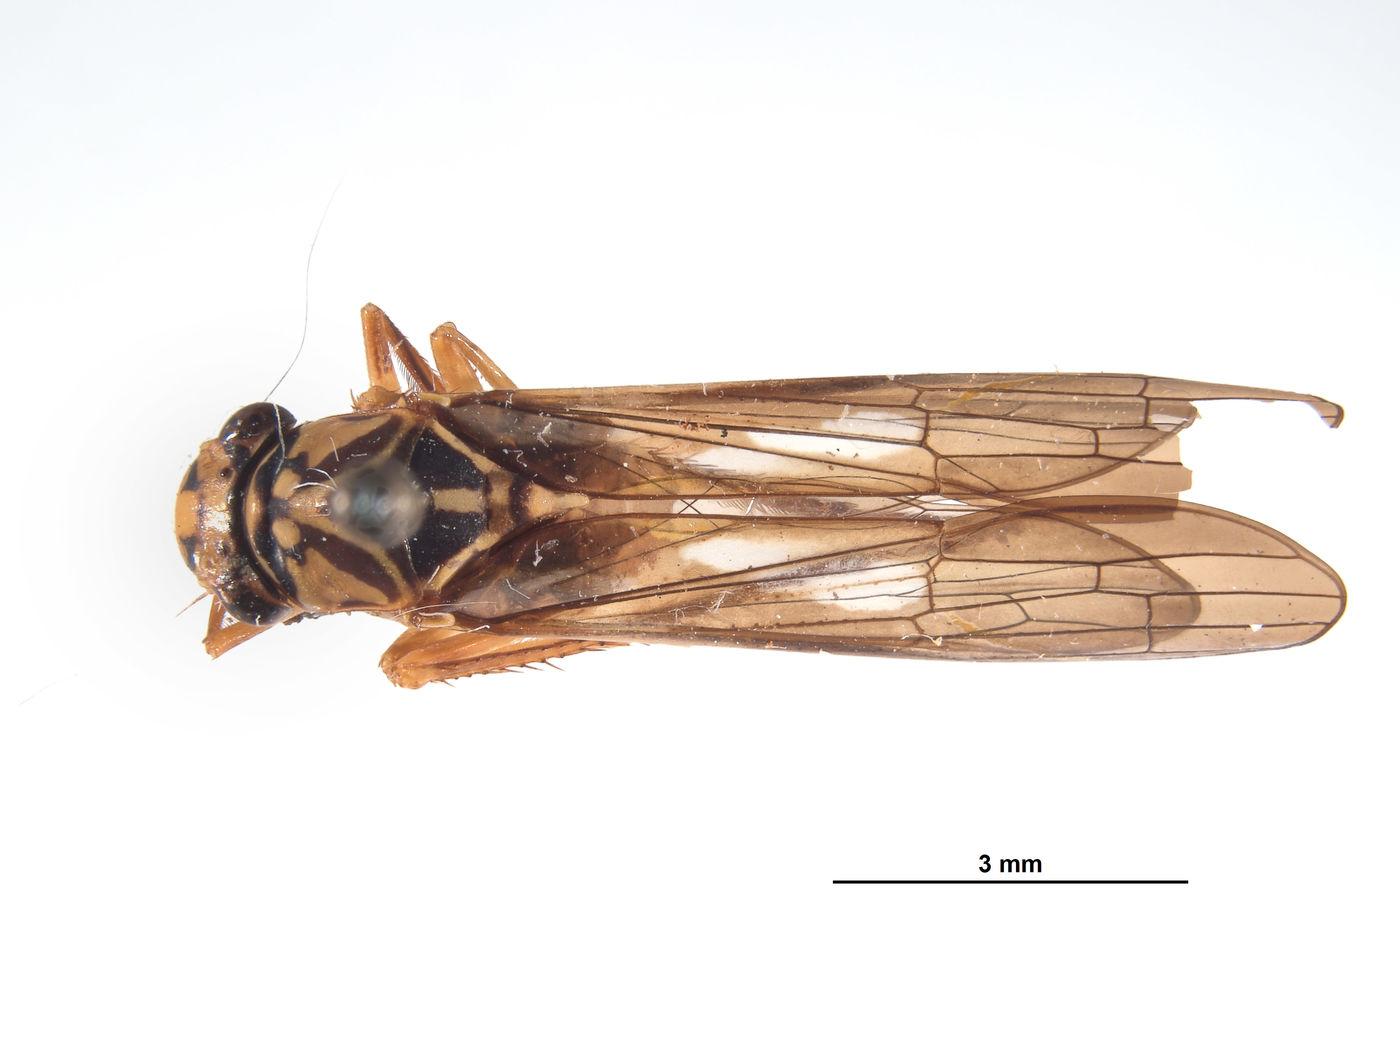 Lissoscarta pereneensis image